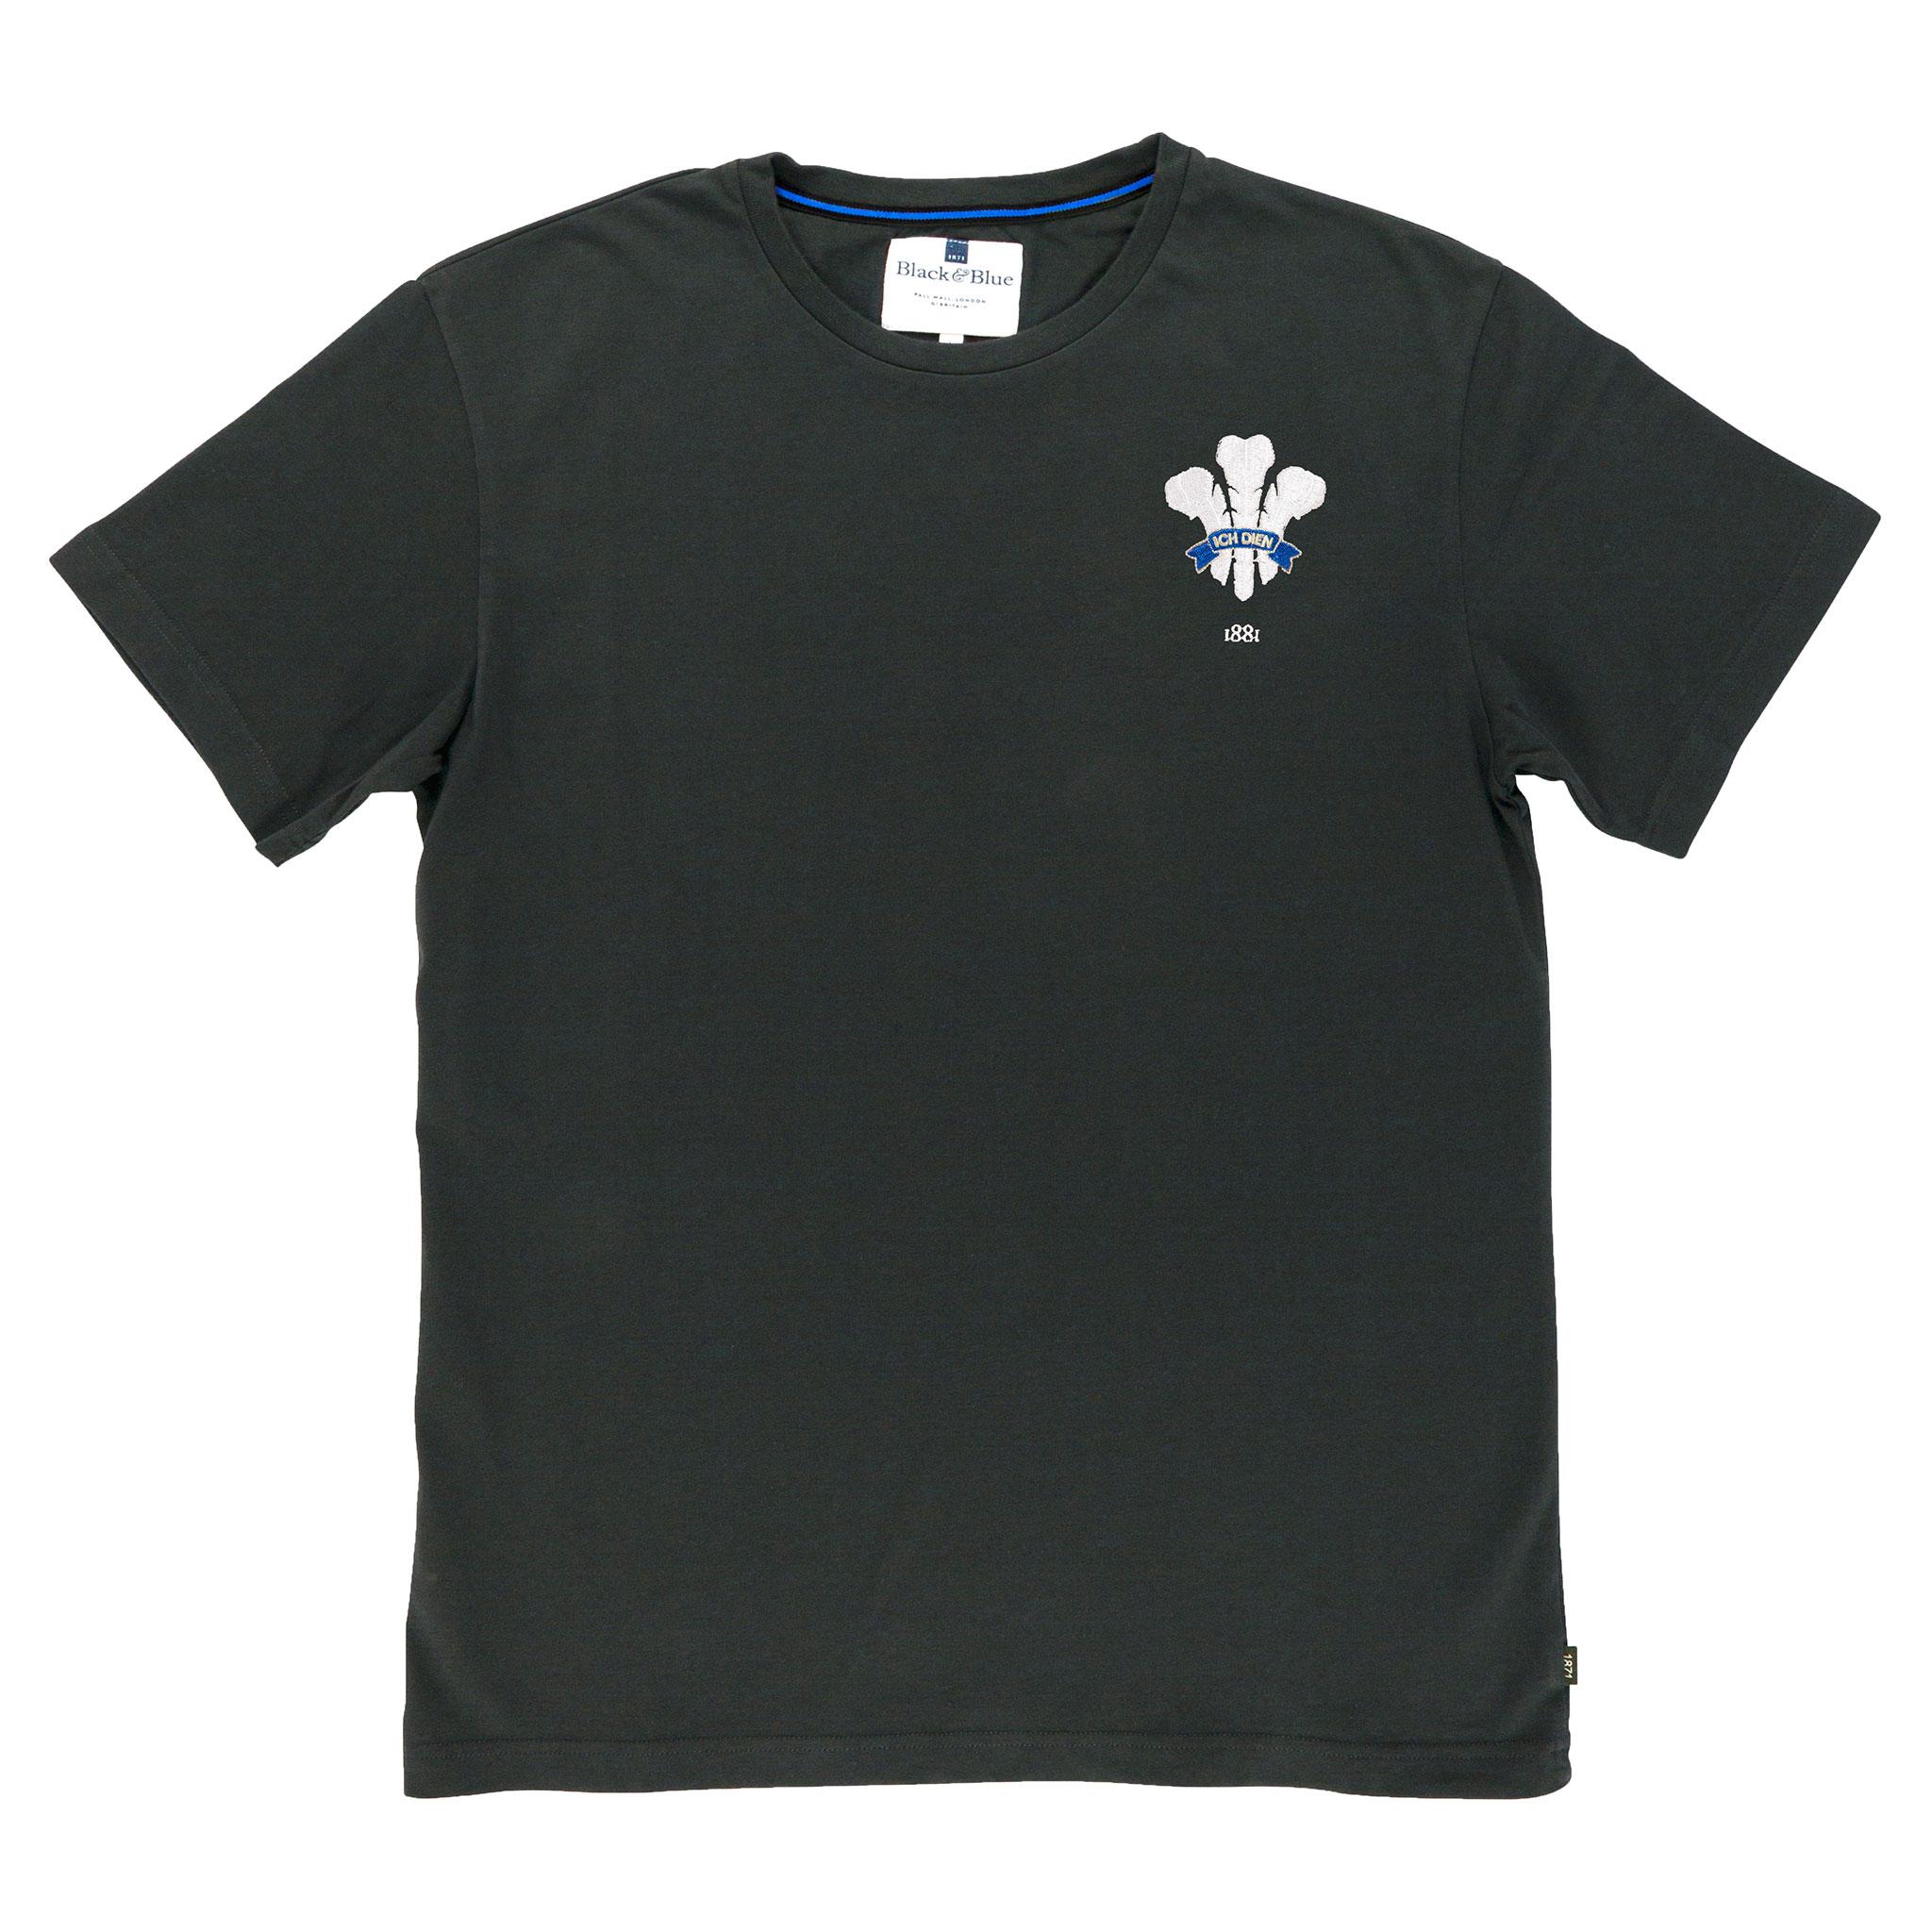 Wales 1881 Asphalt Tshirt_Front